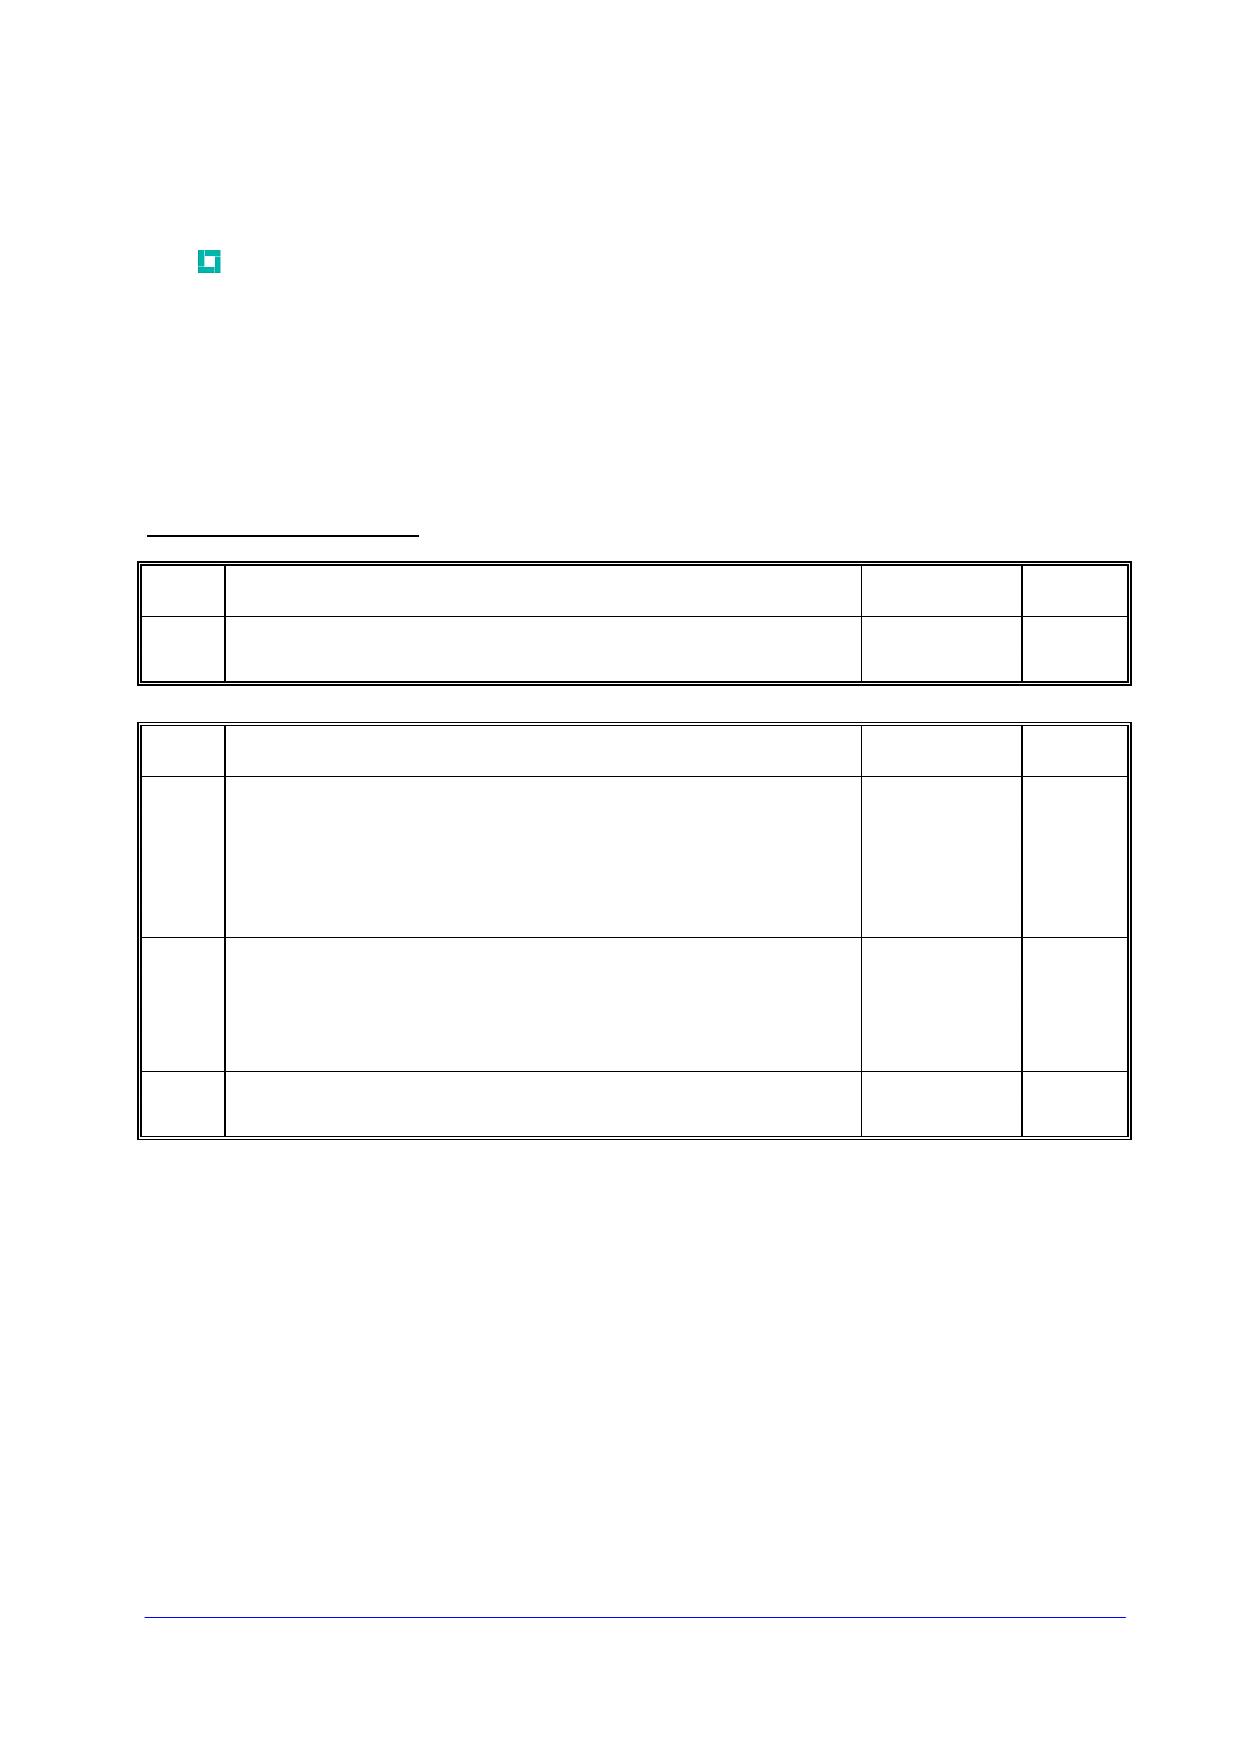 M0659LC400 دیتاشیت PDF